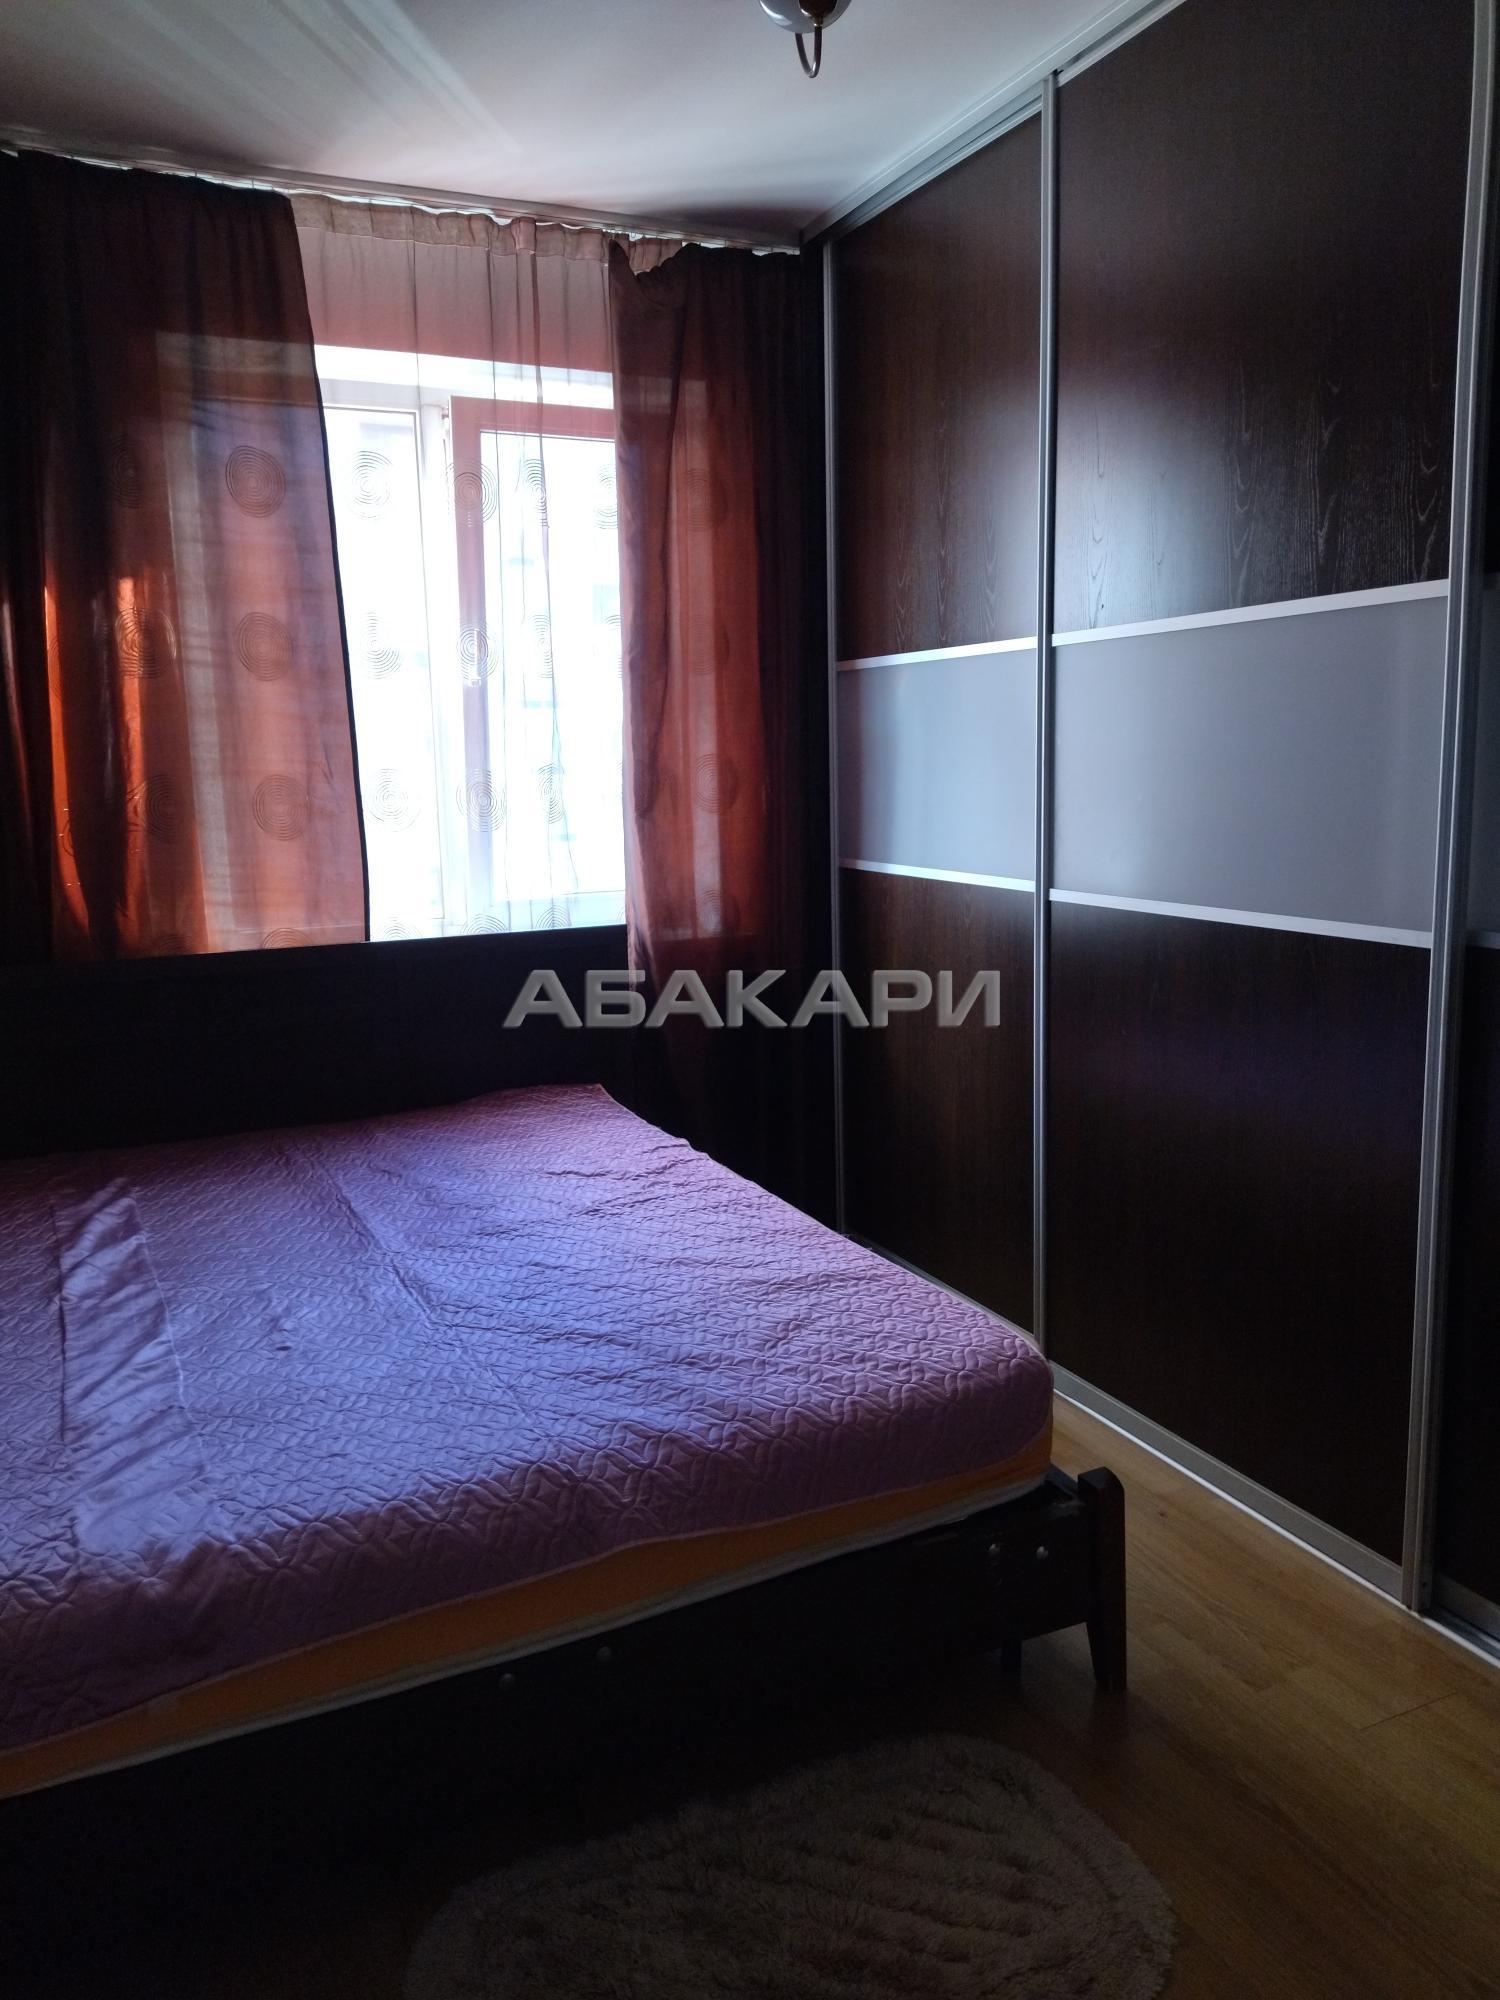 3к квартира Взлетная улица, 16 5/10 - 68кв   25000   аренда в Красноярске фото 2